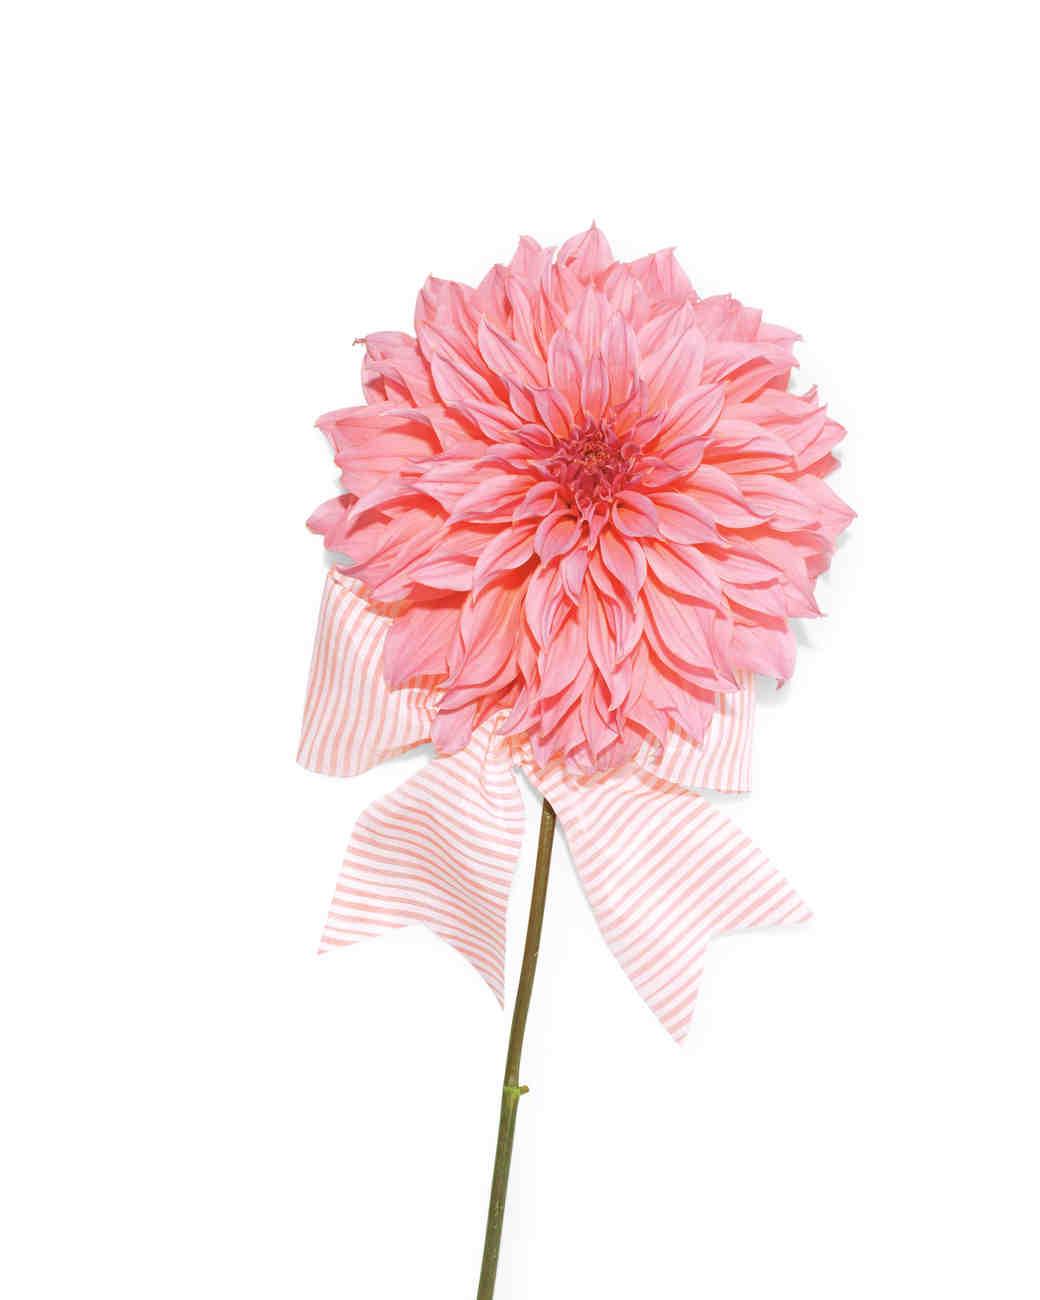 flower-115-mwd110687.jpg